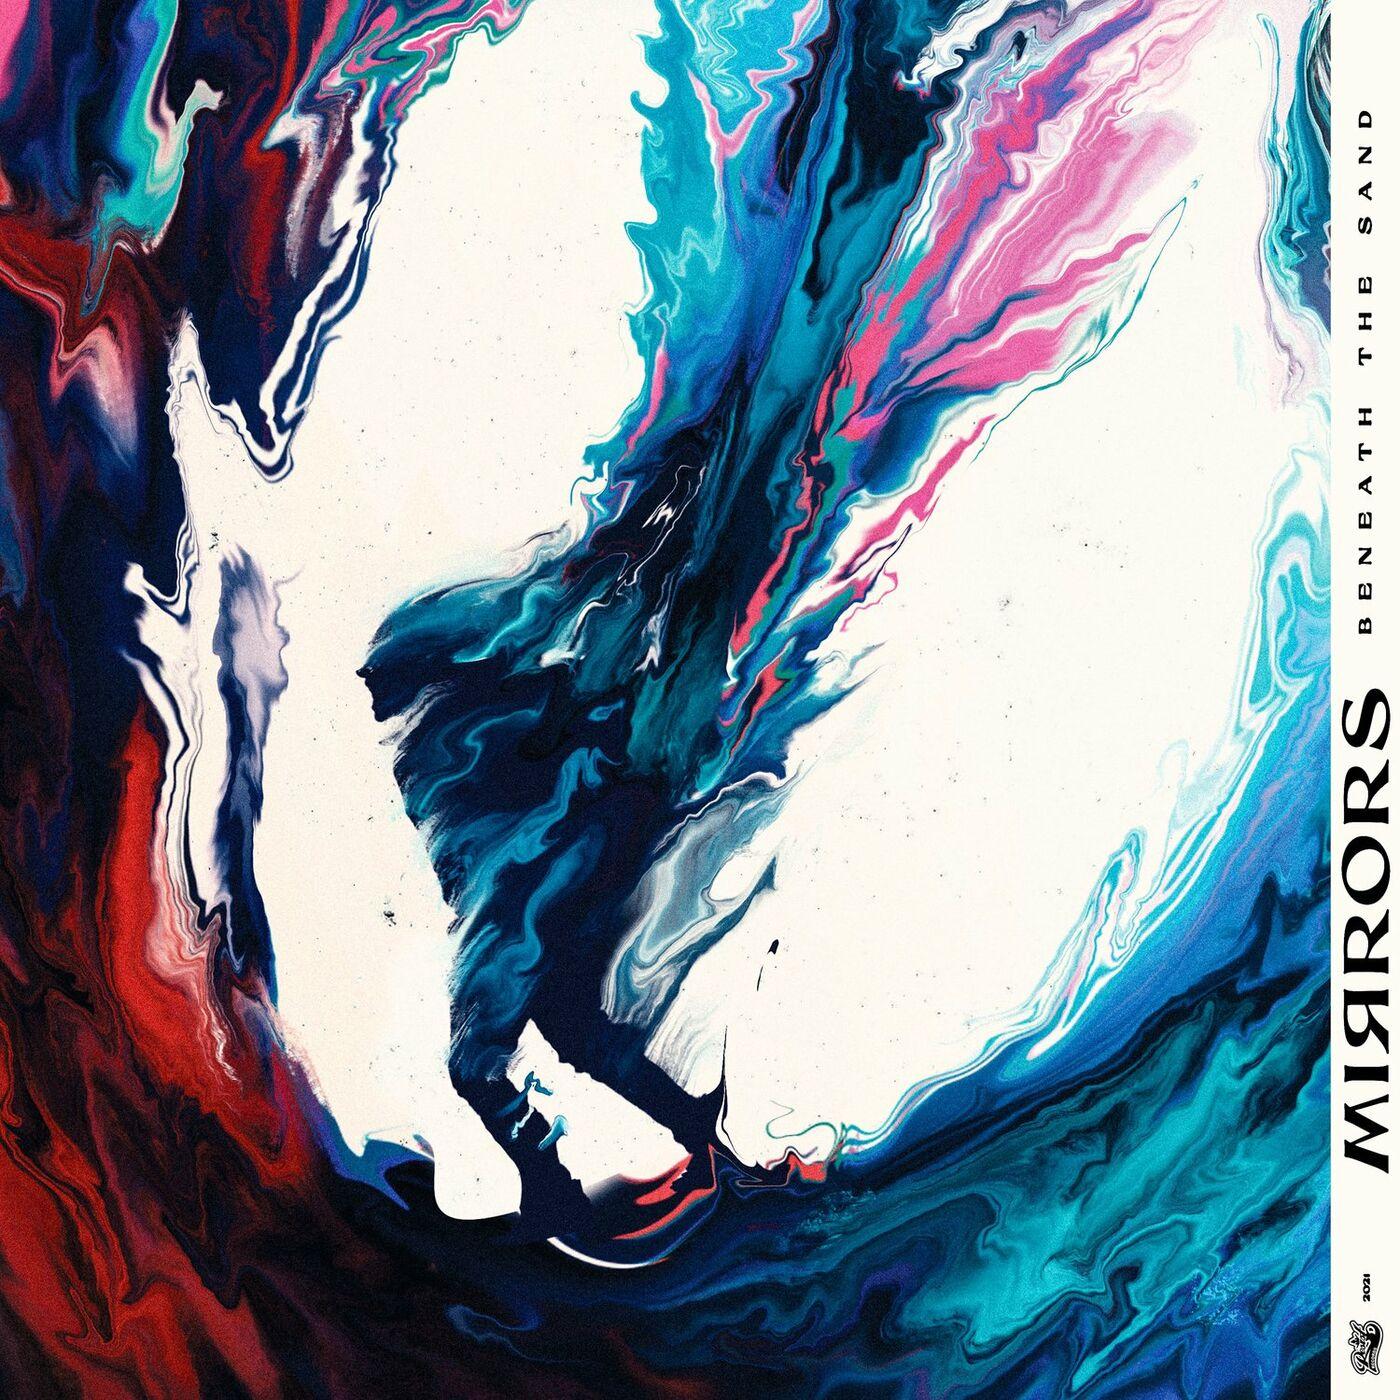 Mirrors - Beneath the Sand [single] (2021)